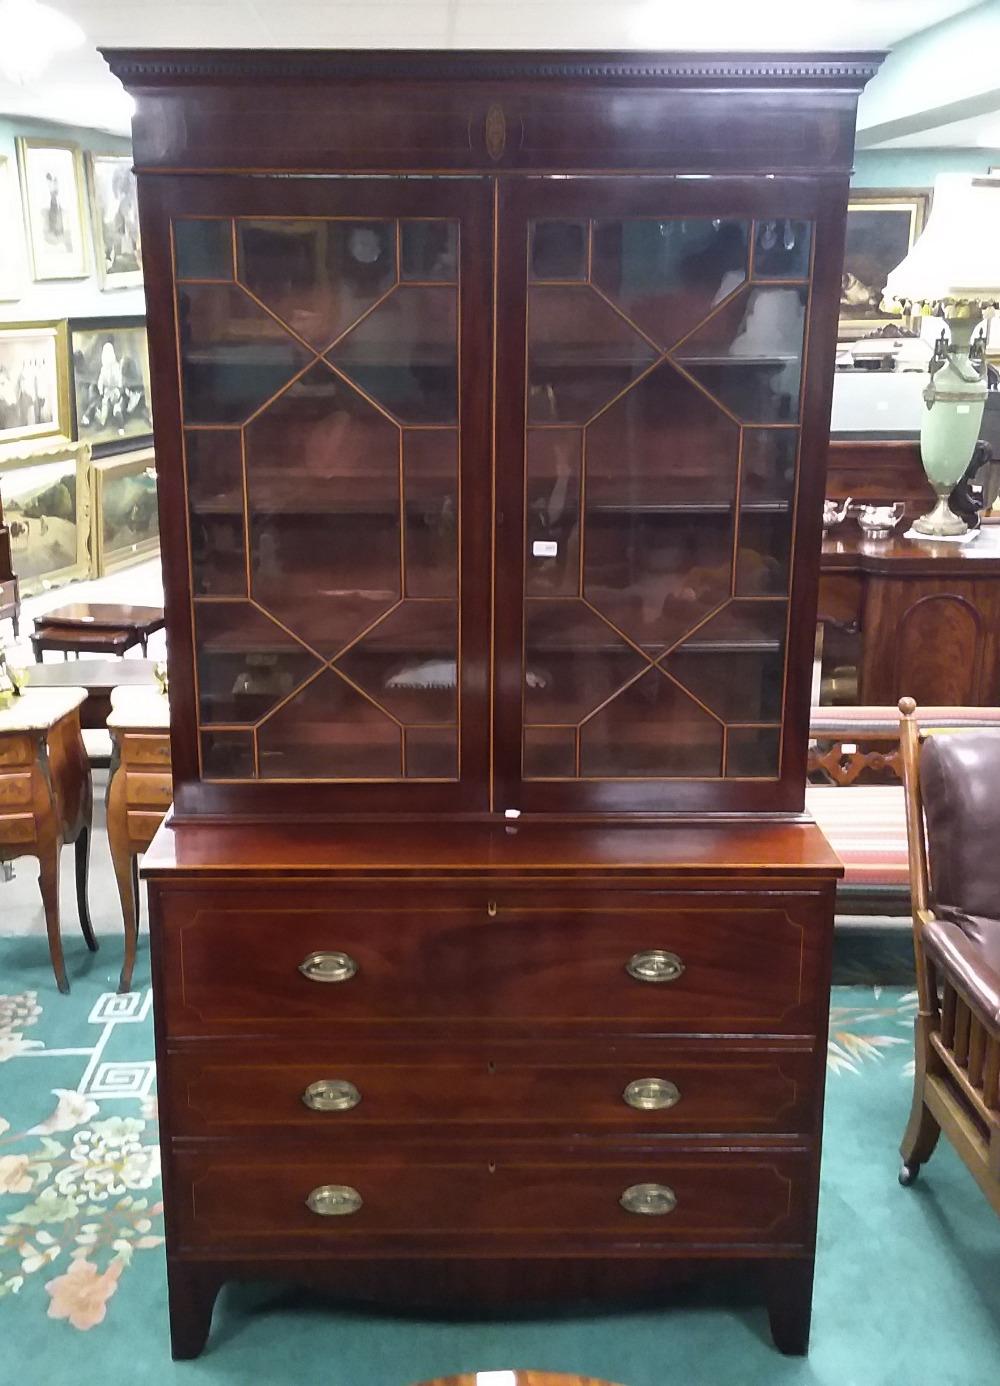 Lot 287 - Stunning Quality Georgian Inlaid Mahogany Secretaire 2 Door Bookcase Dimensions: 117cm W 54cm D